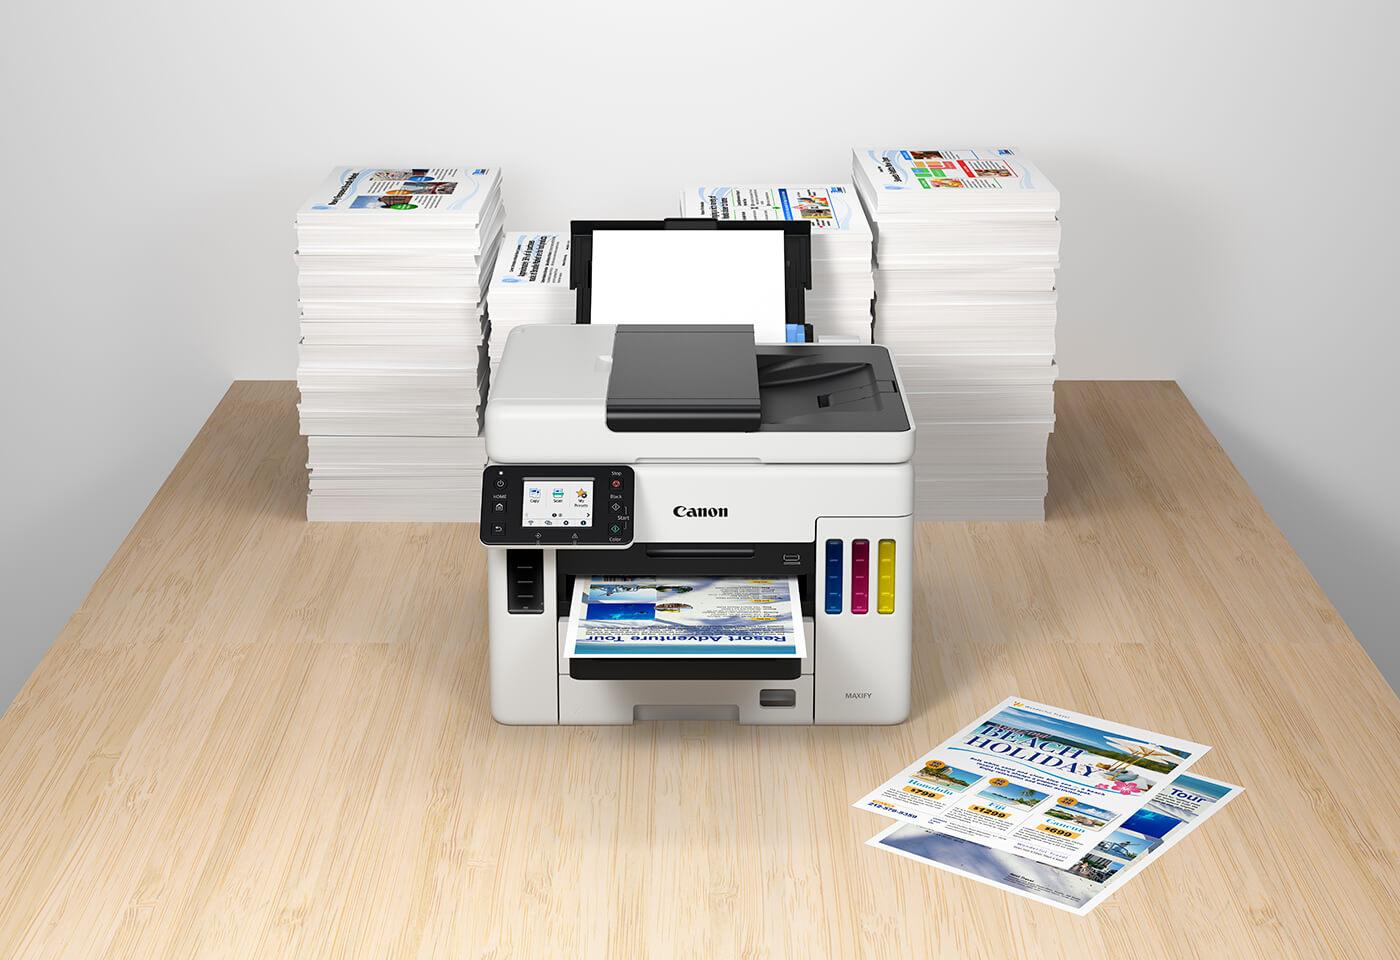 Product image of MAXIFY GX7060 MegaTank printer